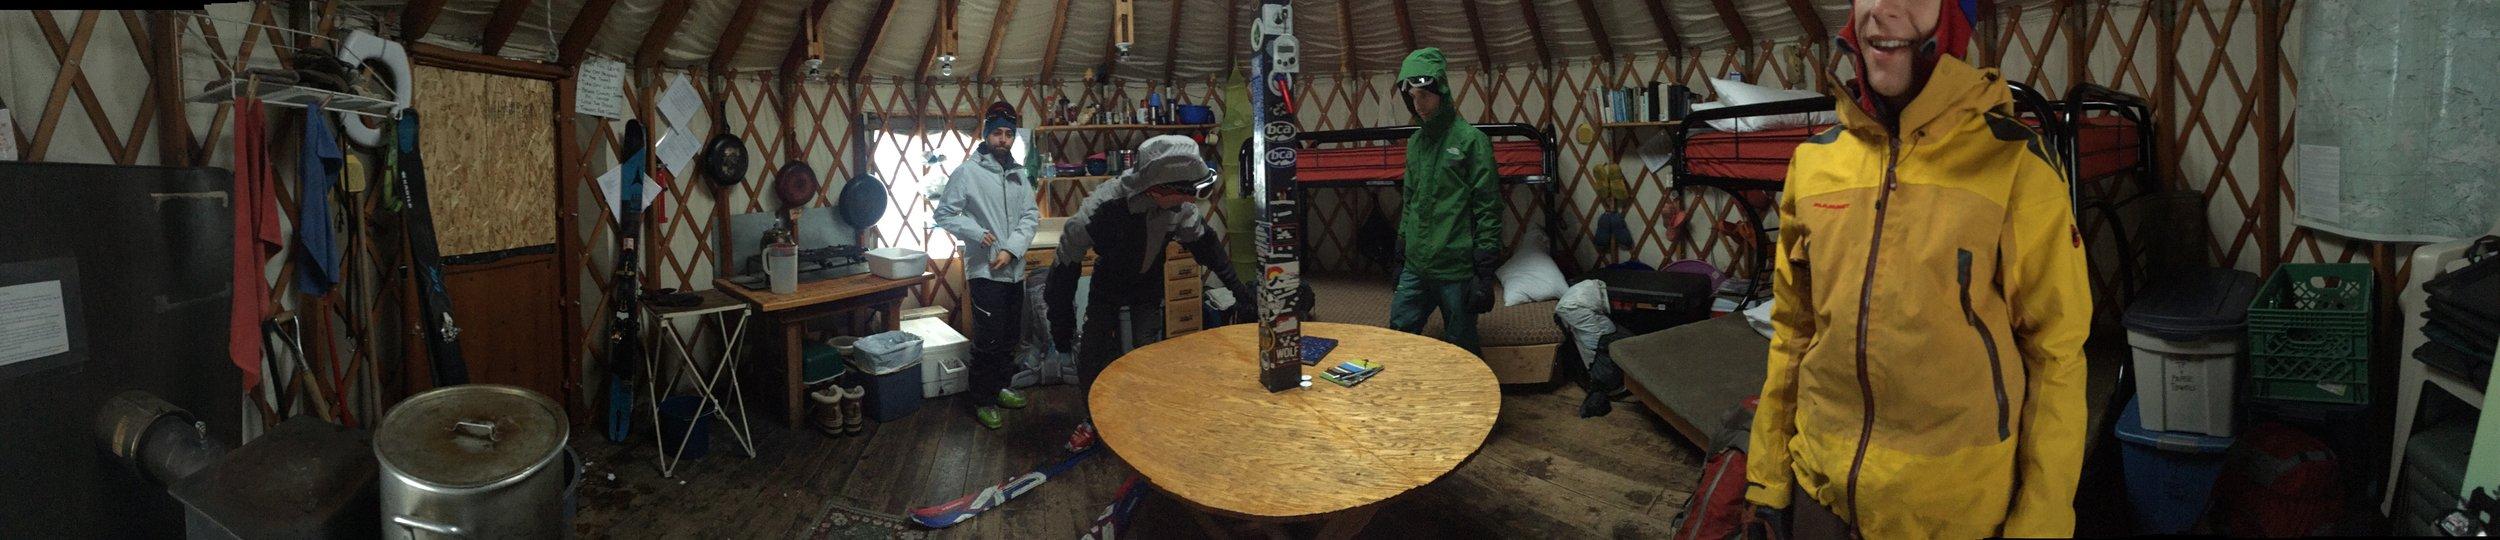 Inside the yurt - cozy.